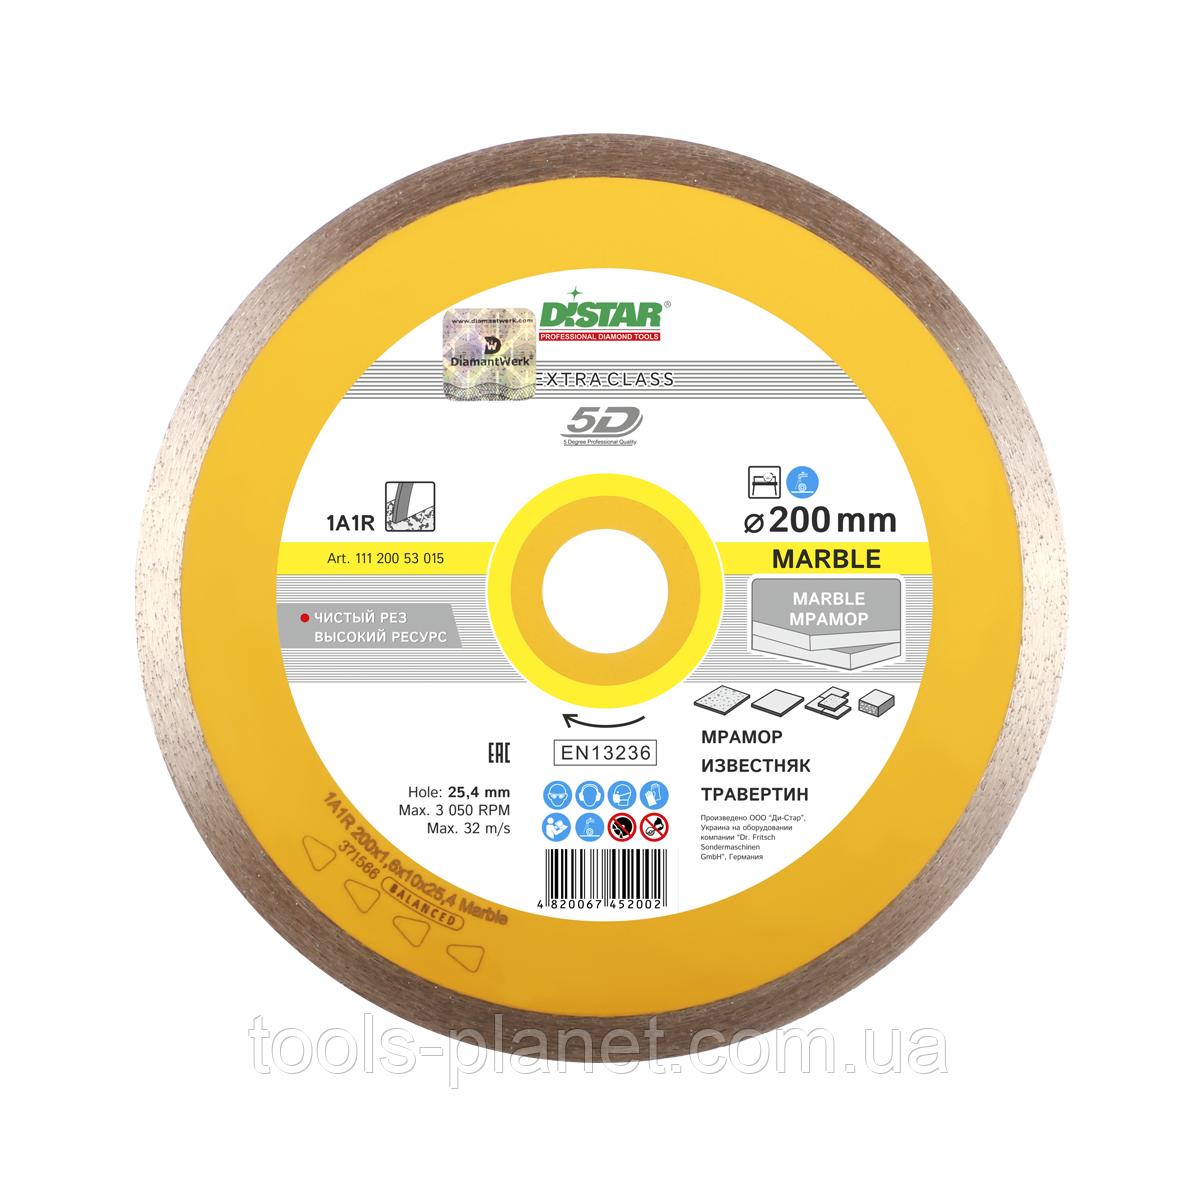 Алмазный диск Distar 1A1R 250 x 1,6 x 10 x 25,4 Marble 5D (11120053019)